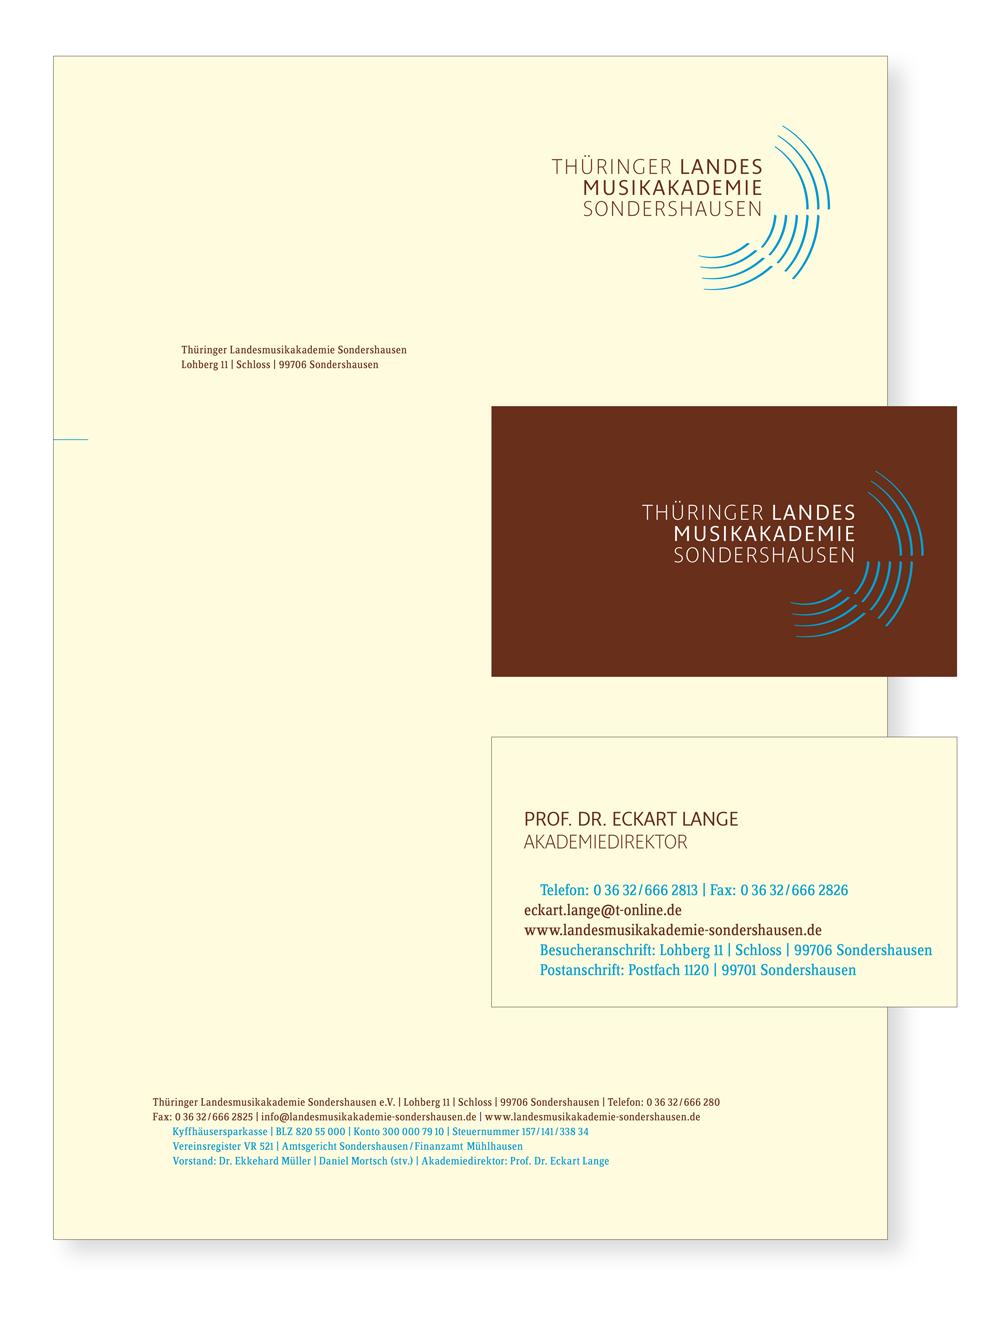 LMA // Briefbogen / Visitenkarten